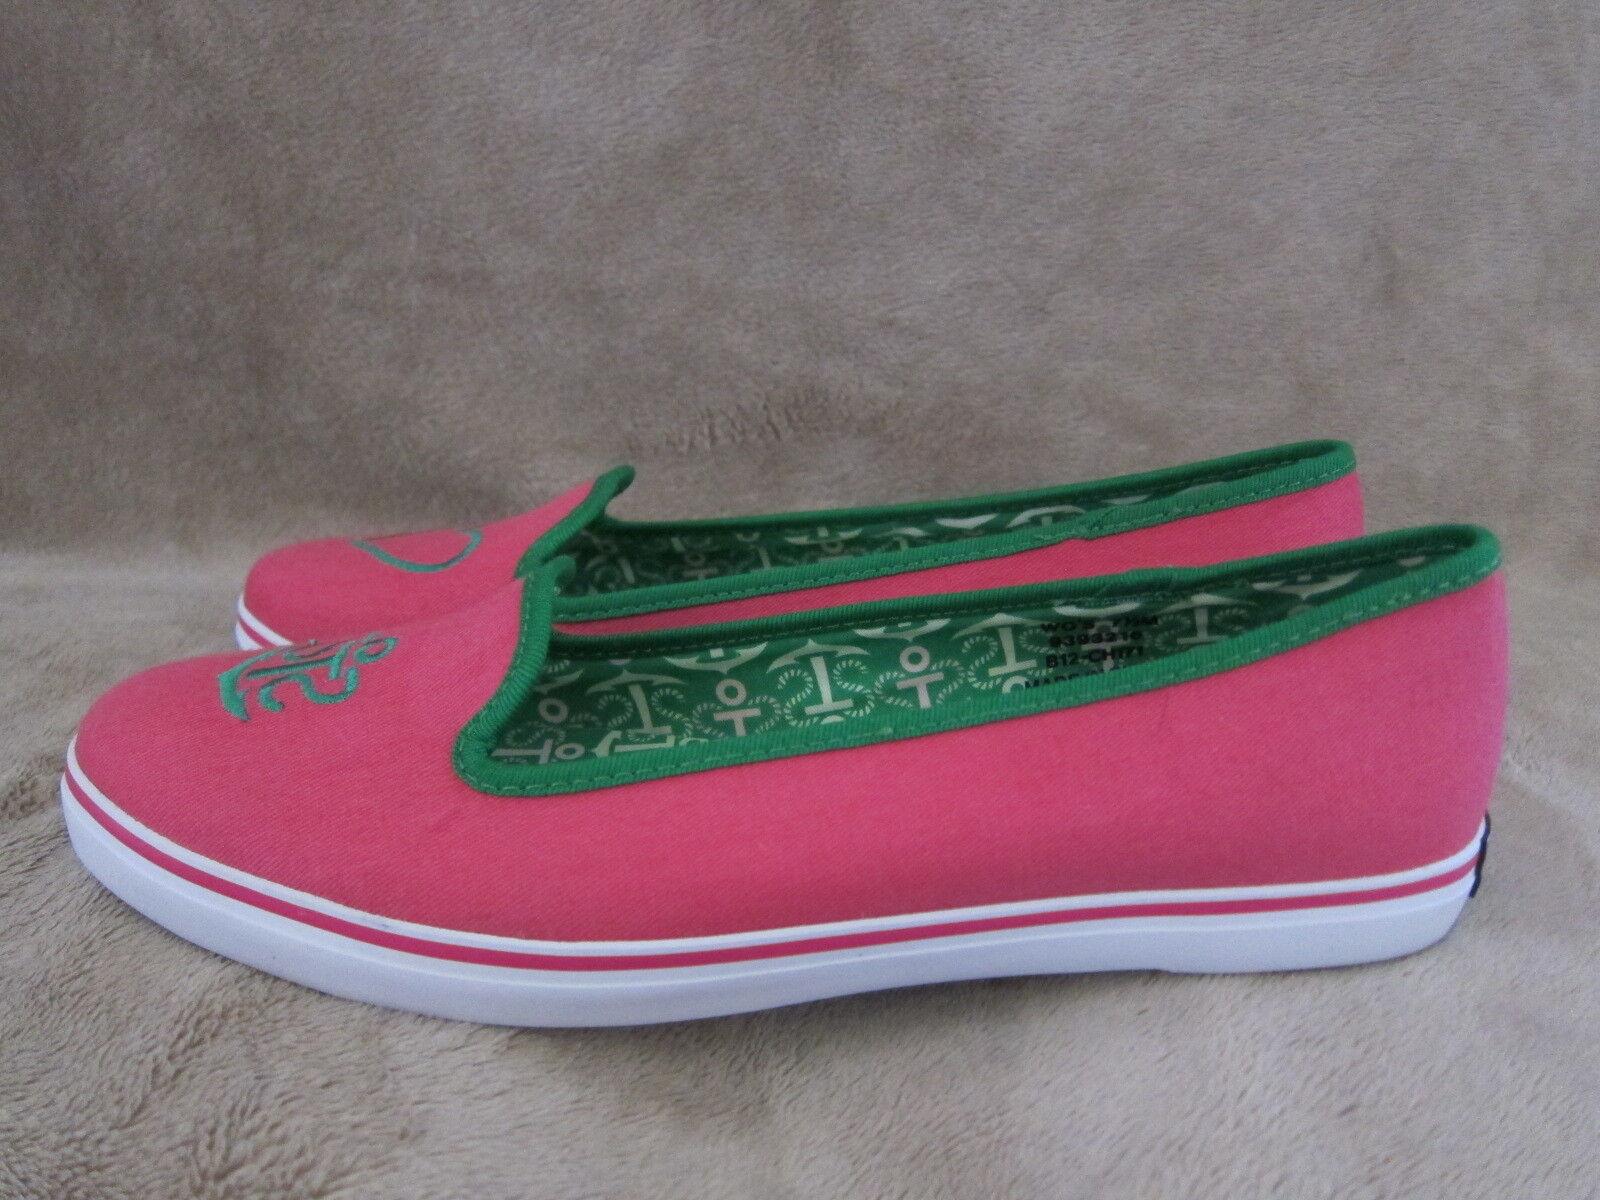 outlet in vendita SPERRY SPERRY SPERRY Top Sider Westport rosa & verde Slip On Flats scarpe donna US 7.5 NWOB  miglior reputazione